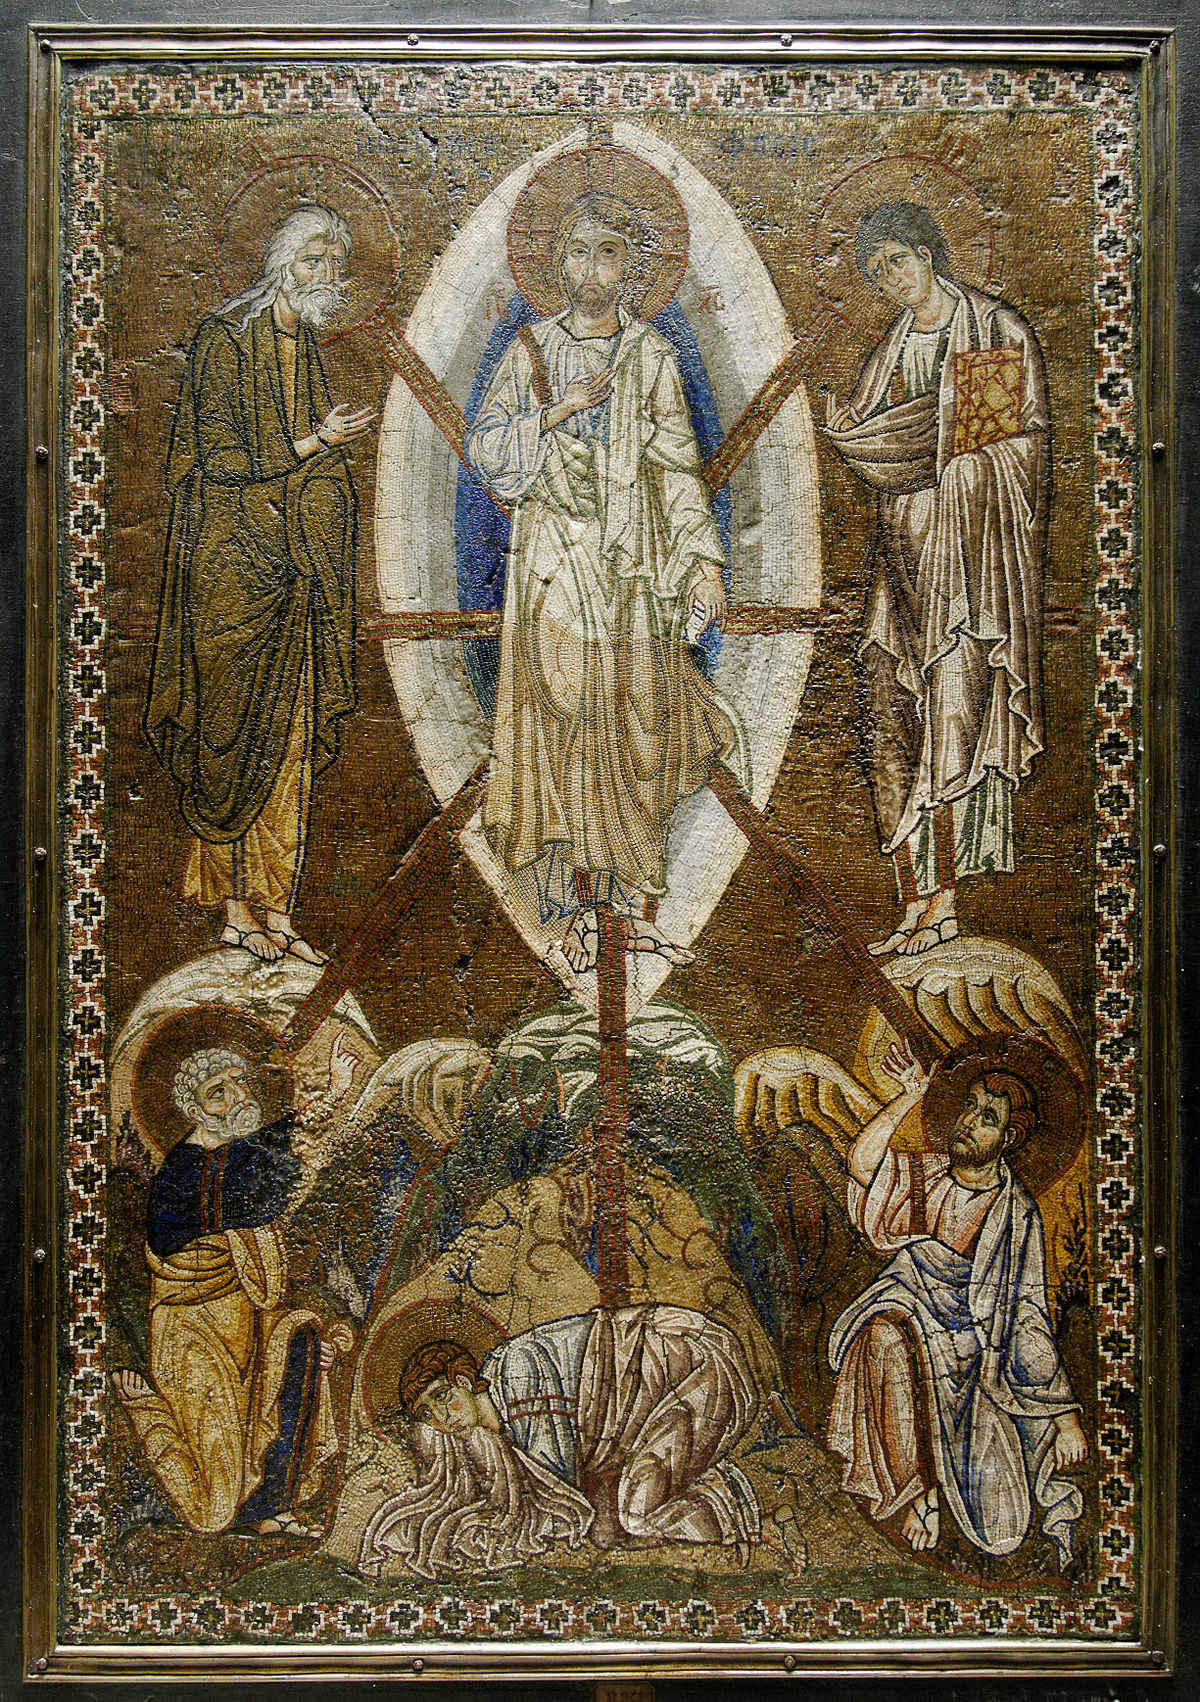 Transfiguration of Jesus - Wikipedia | 1200 x 1702 jpeg 1030kB